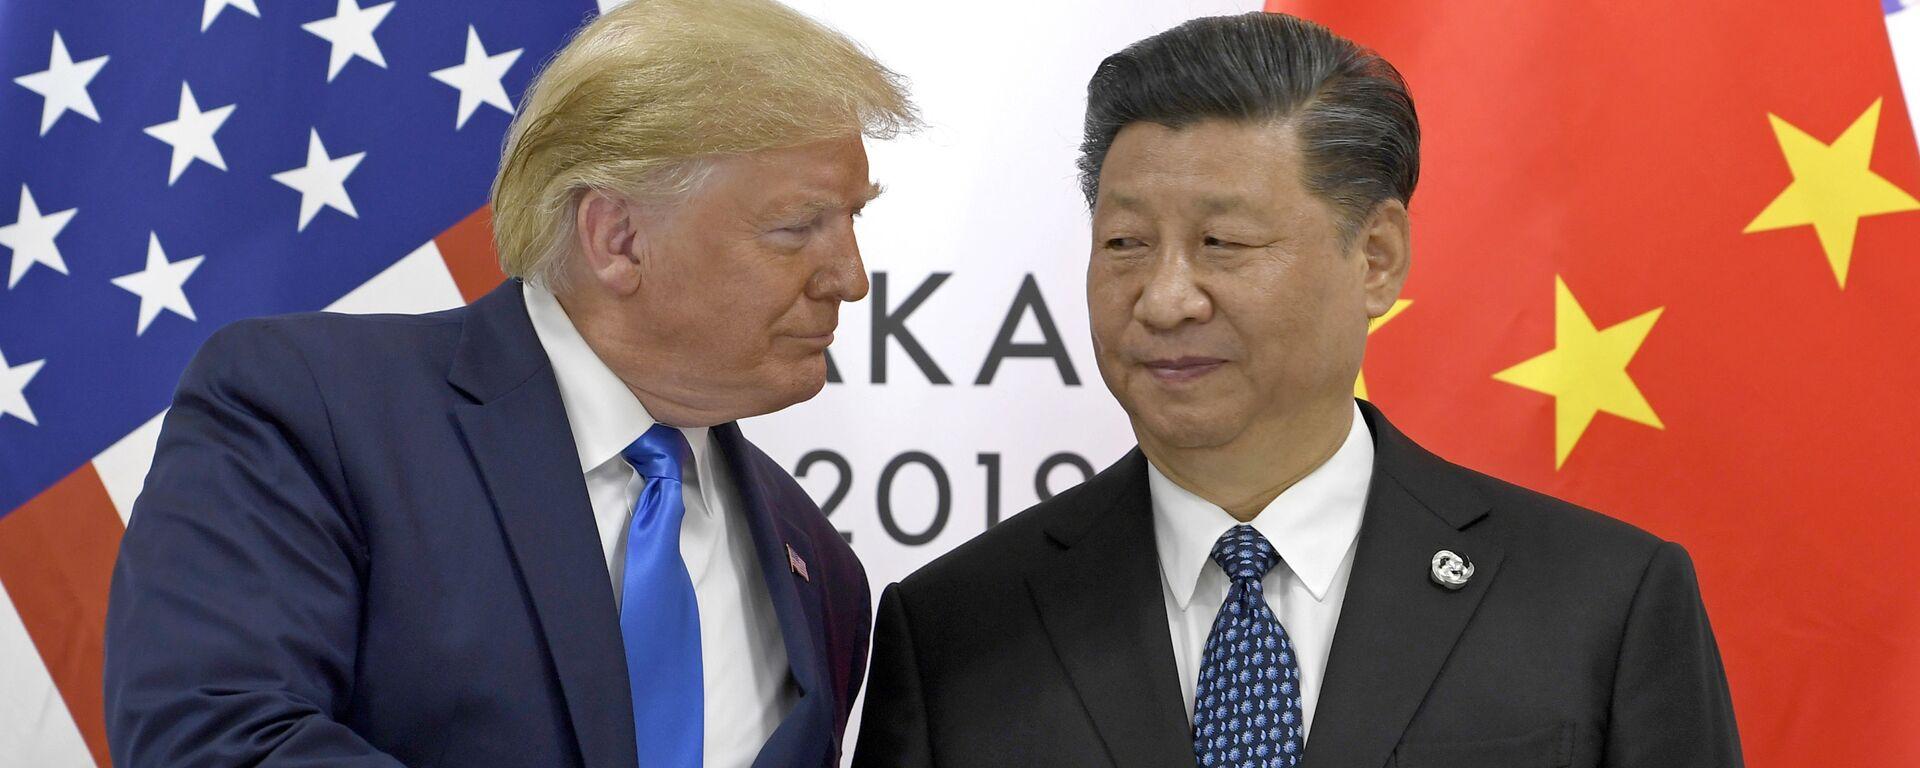 Президент США Дональд Трамп и глава КНР Си Цзиньпин на встрече в рамках саммита G20 в Осаке - Sputnik Грузия, 1920, 26.10.2020